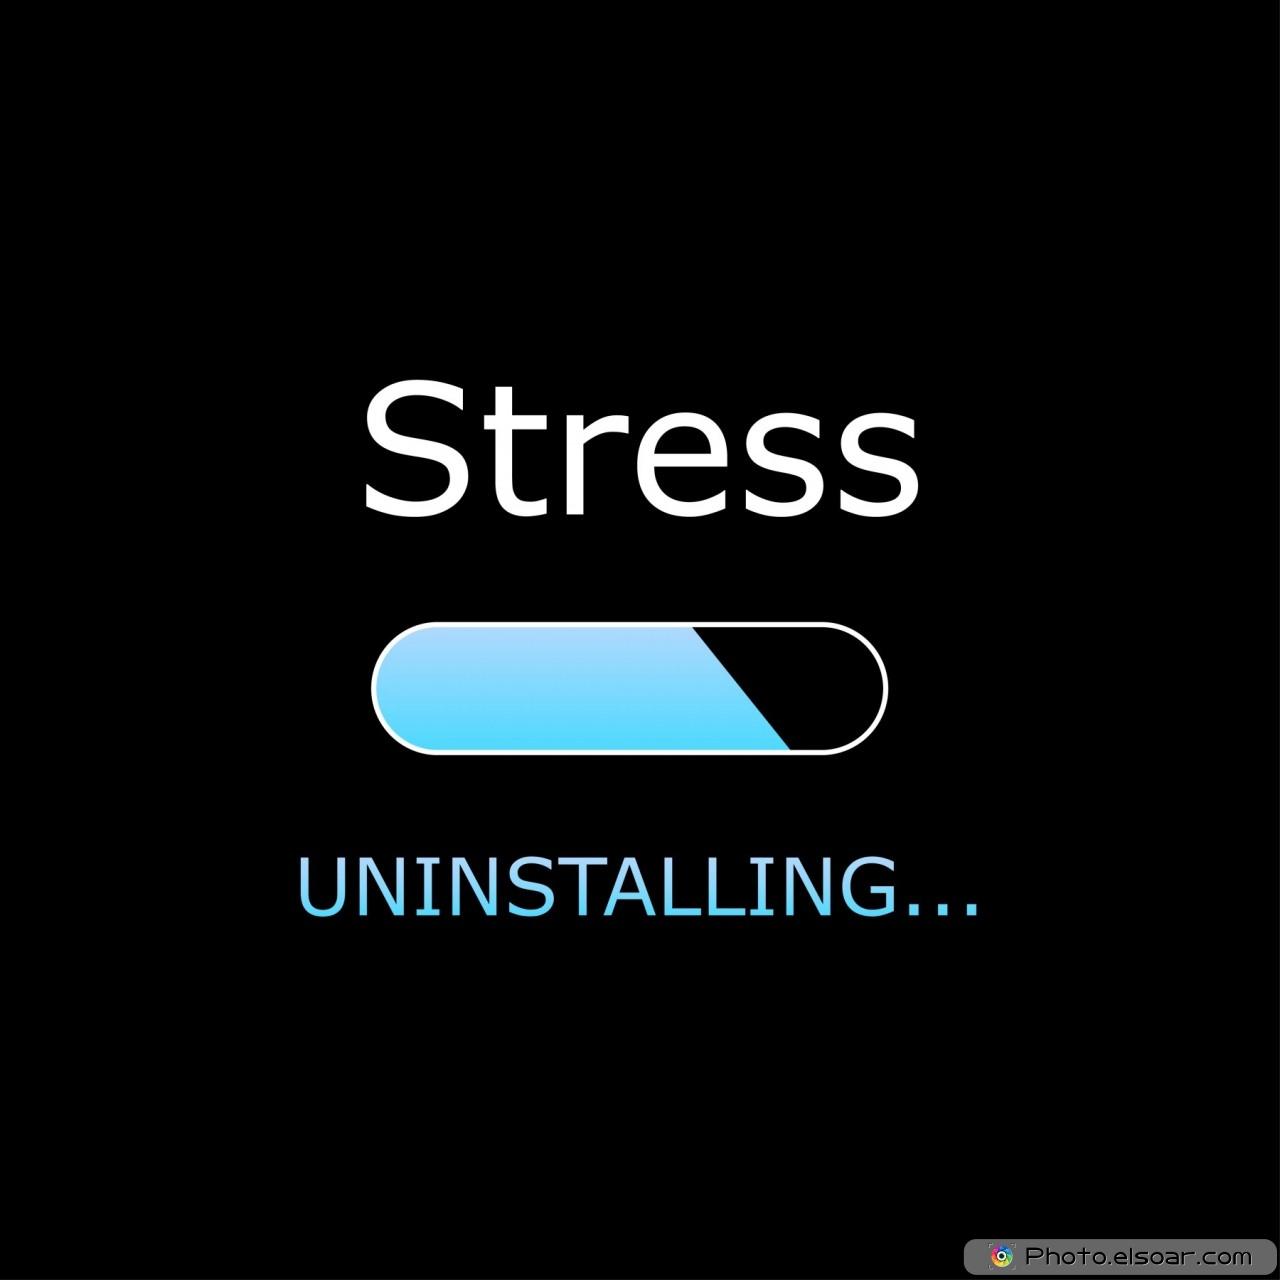 Uninstalling Stress